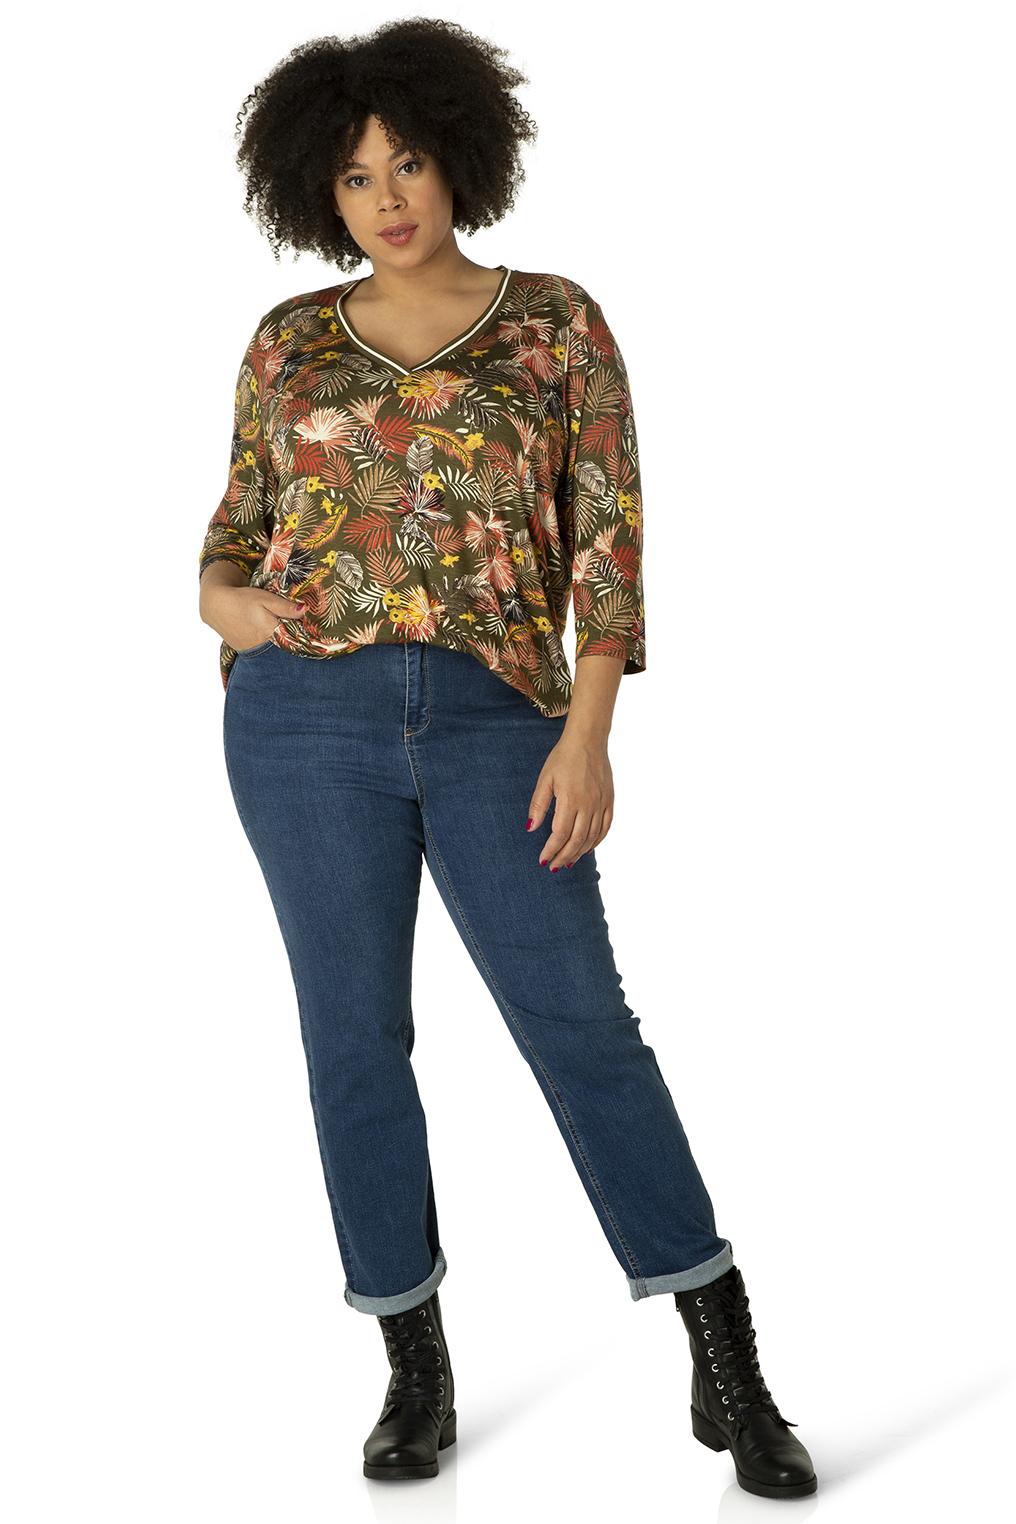 Ivy Bella Shirt Urika 73 cm